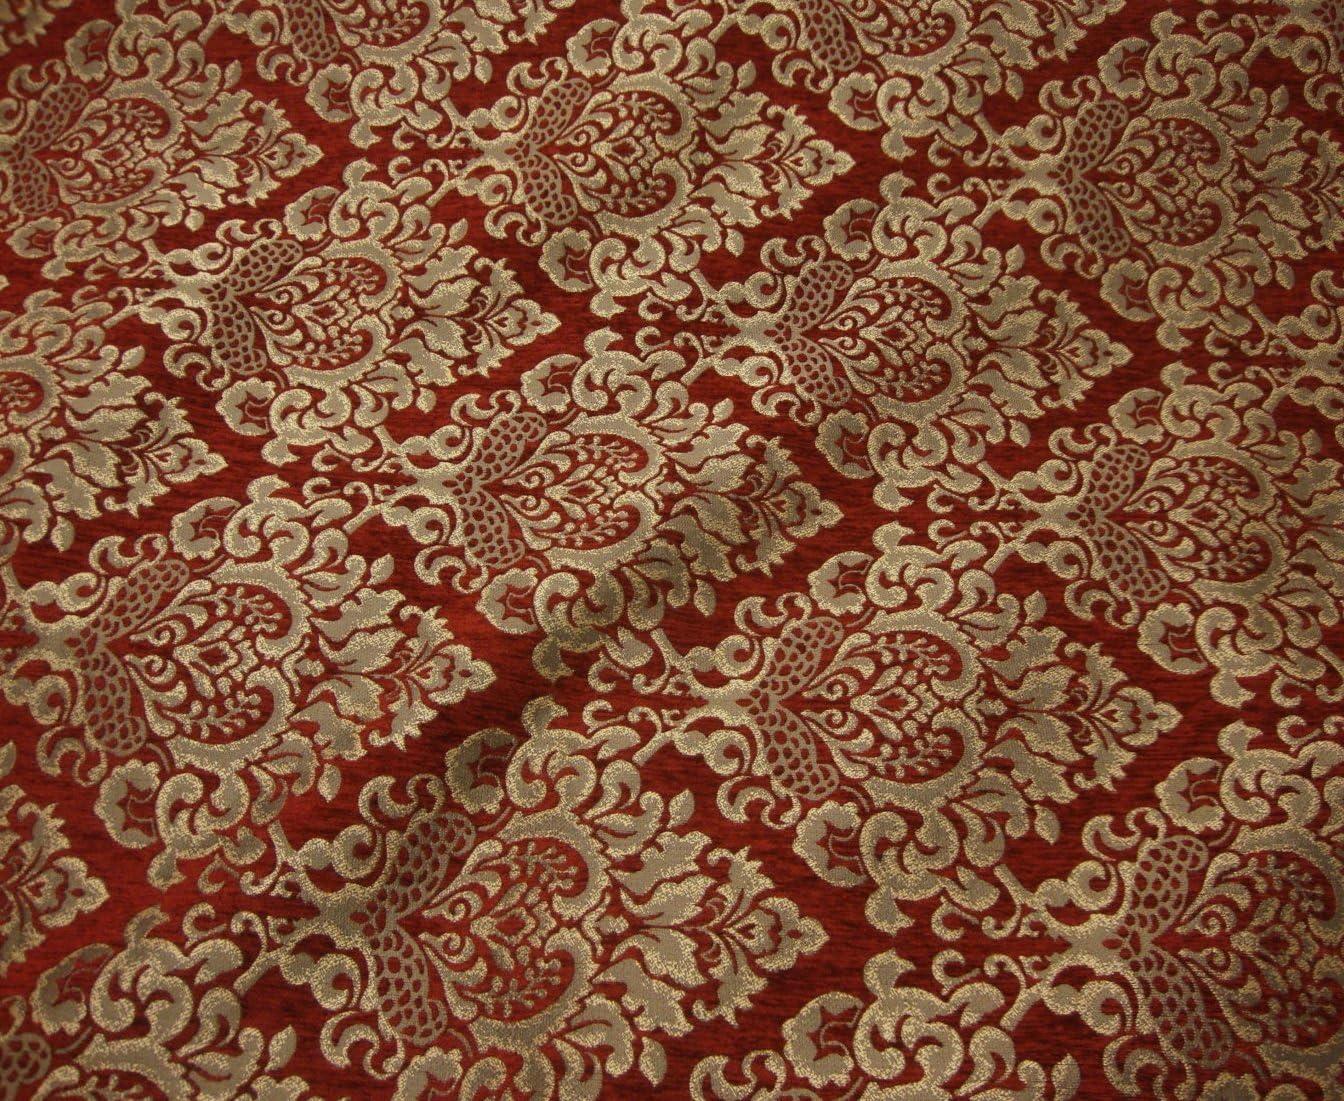 Tela decorativa para cubrir la cama el sof/á Tex Family de tela de loneta de camuflaje verde 1 plaza